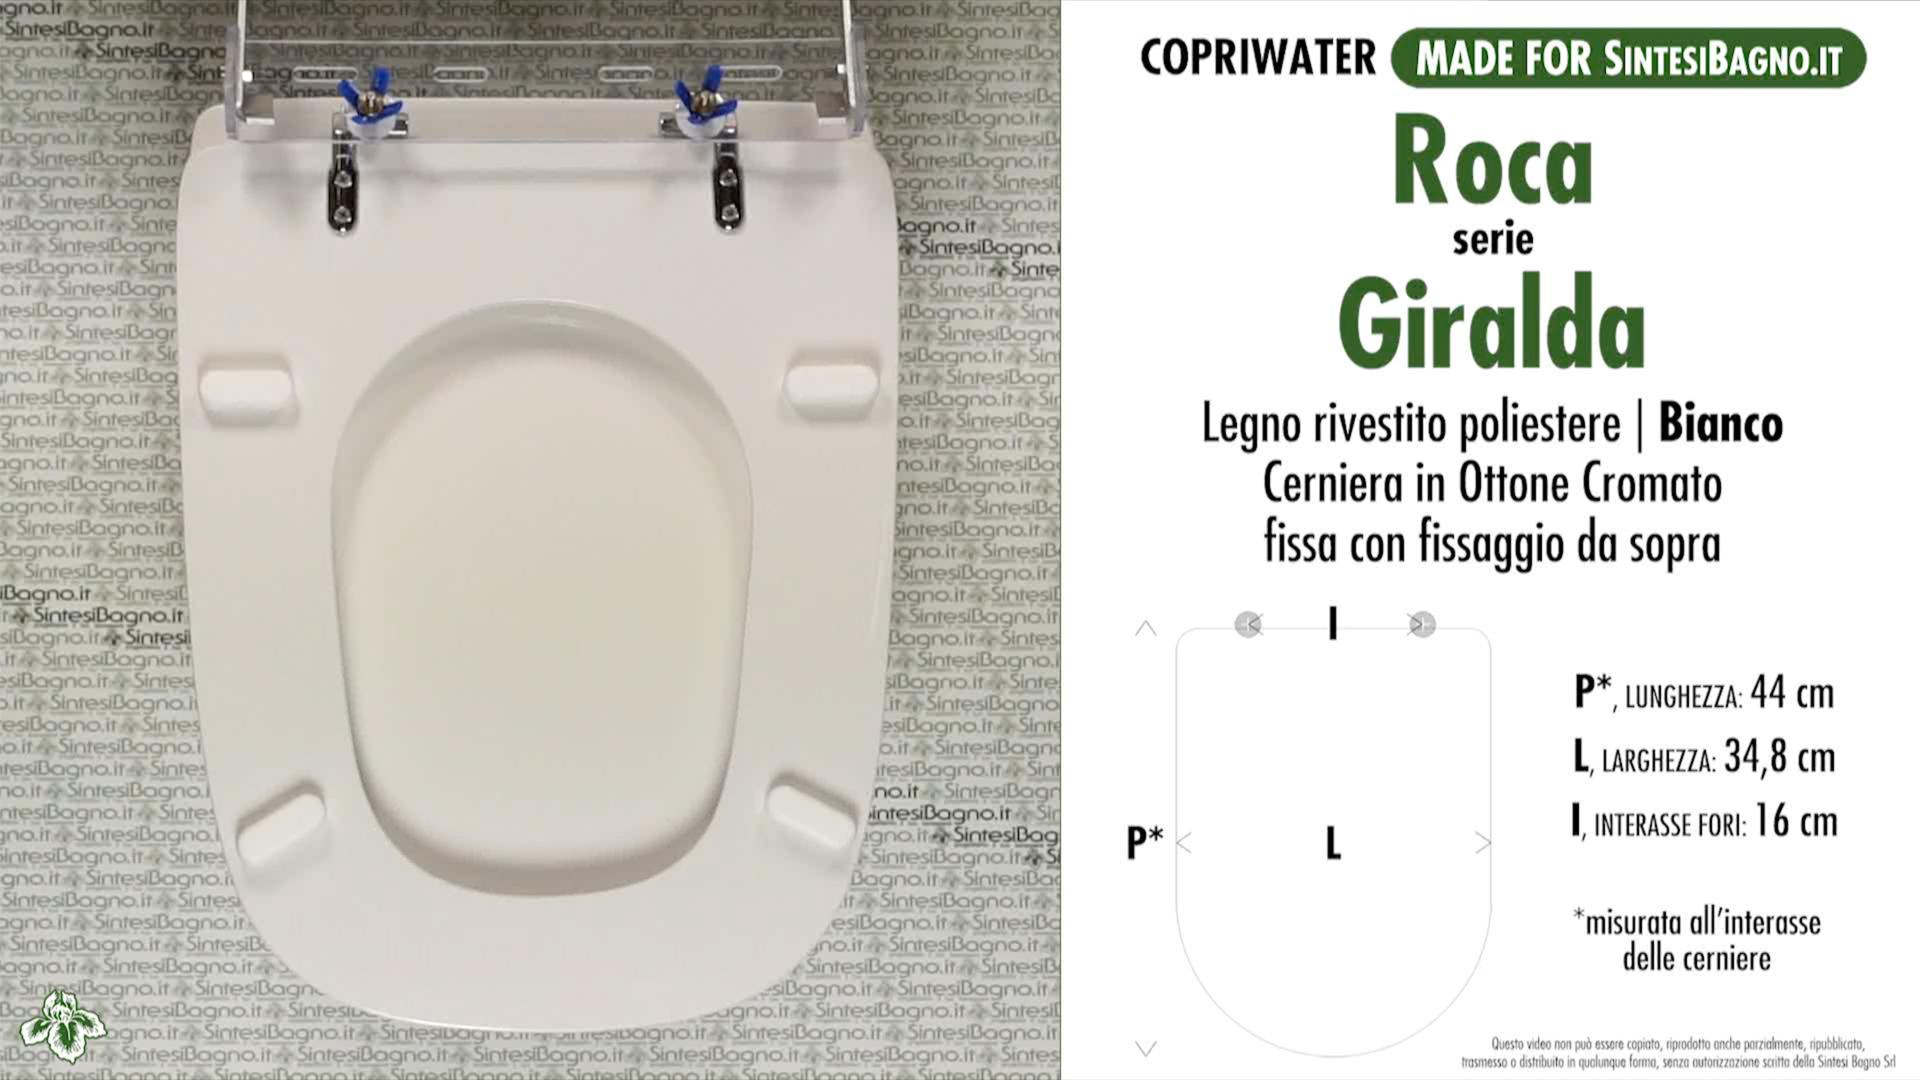 SCHEDA TECNICA MISURE copriwater ROCA GIRALDA